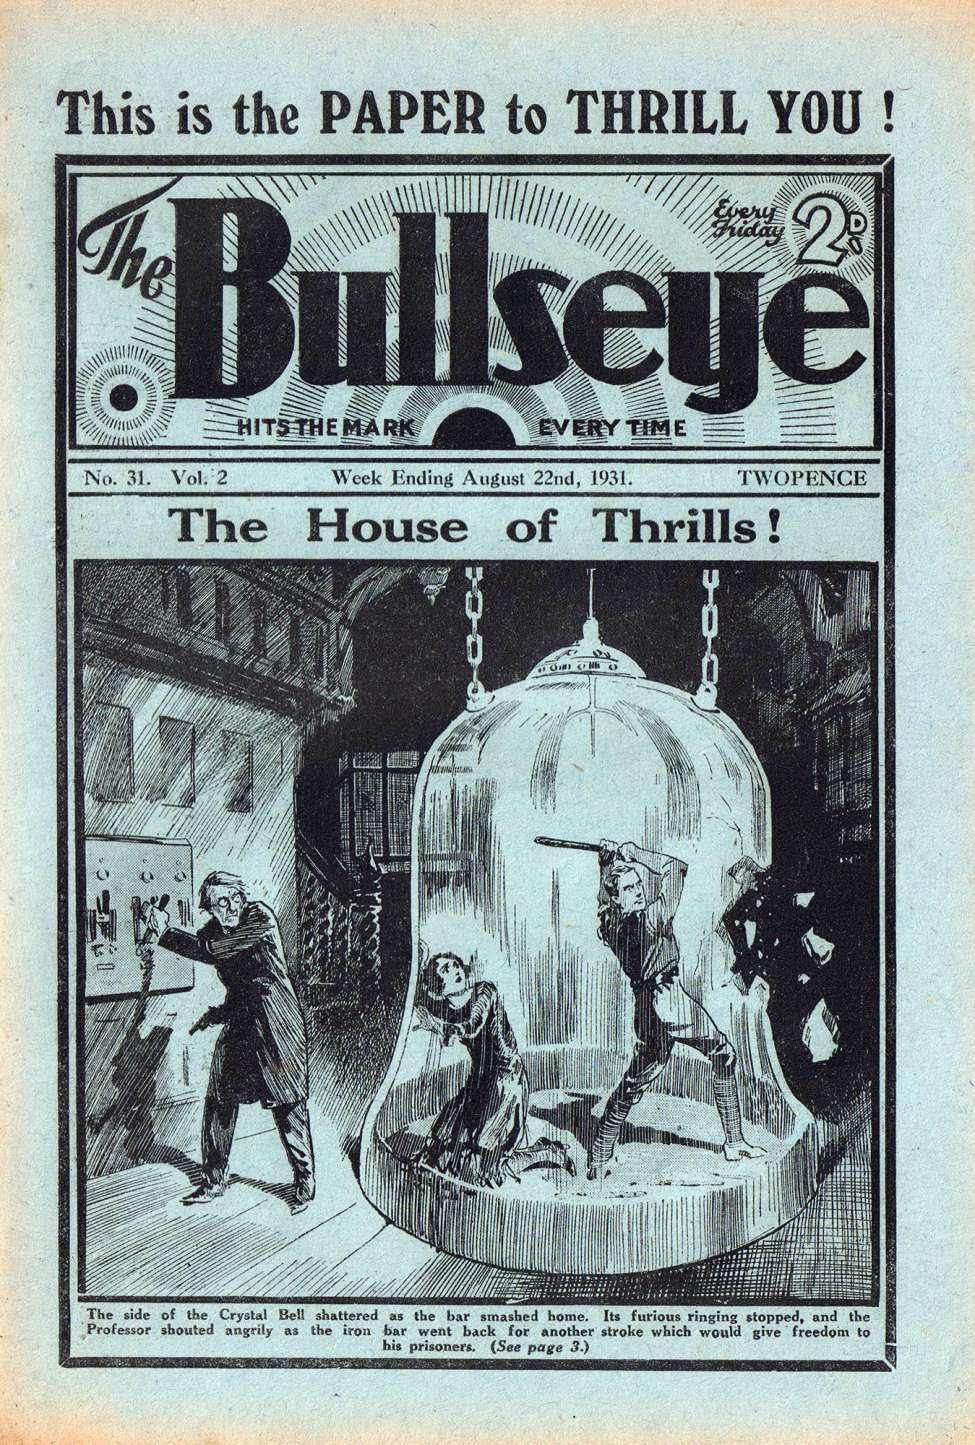 Comic Book Cover For The Bullseye v02 31 - The House of Thrills